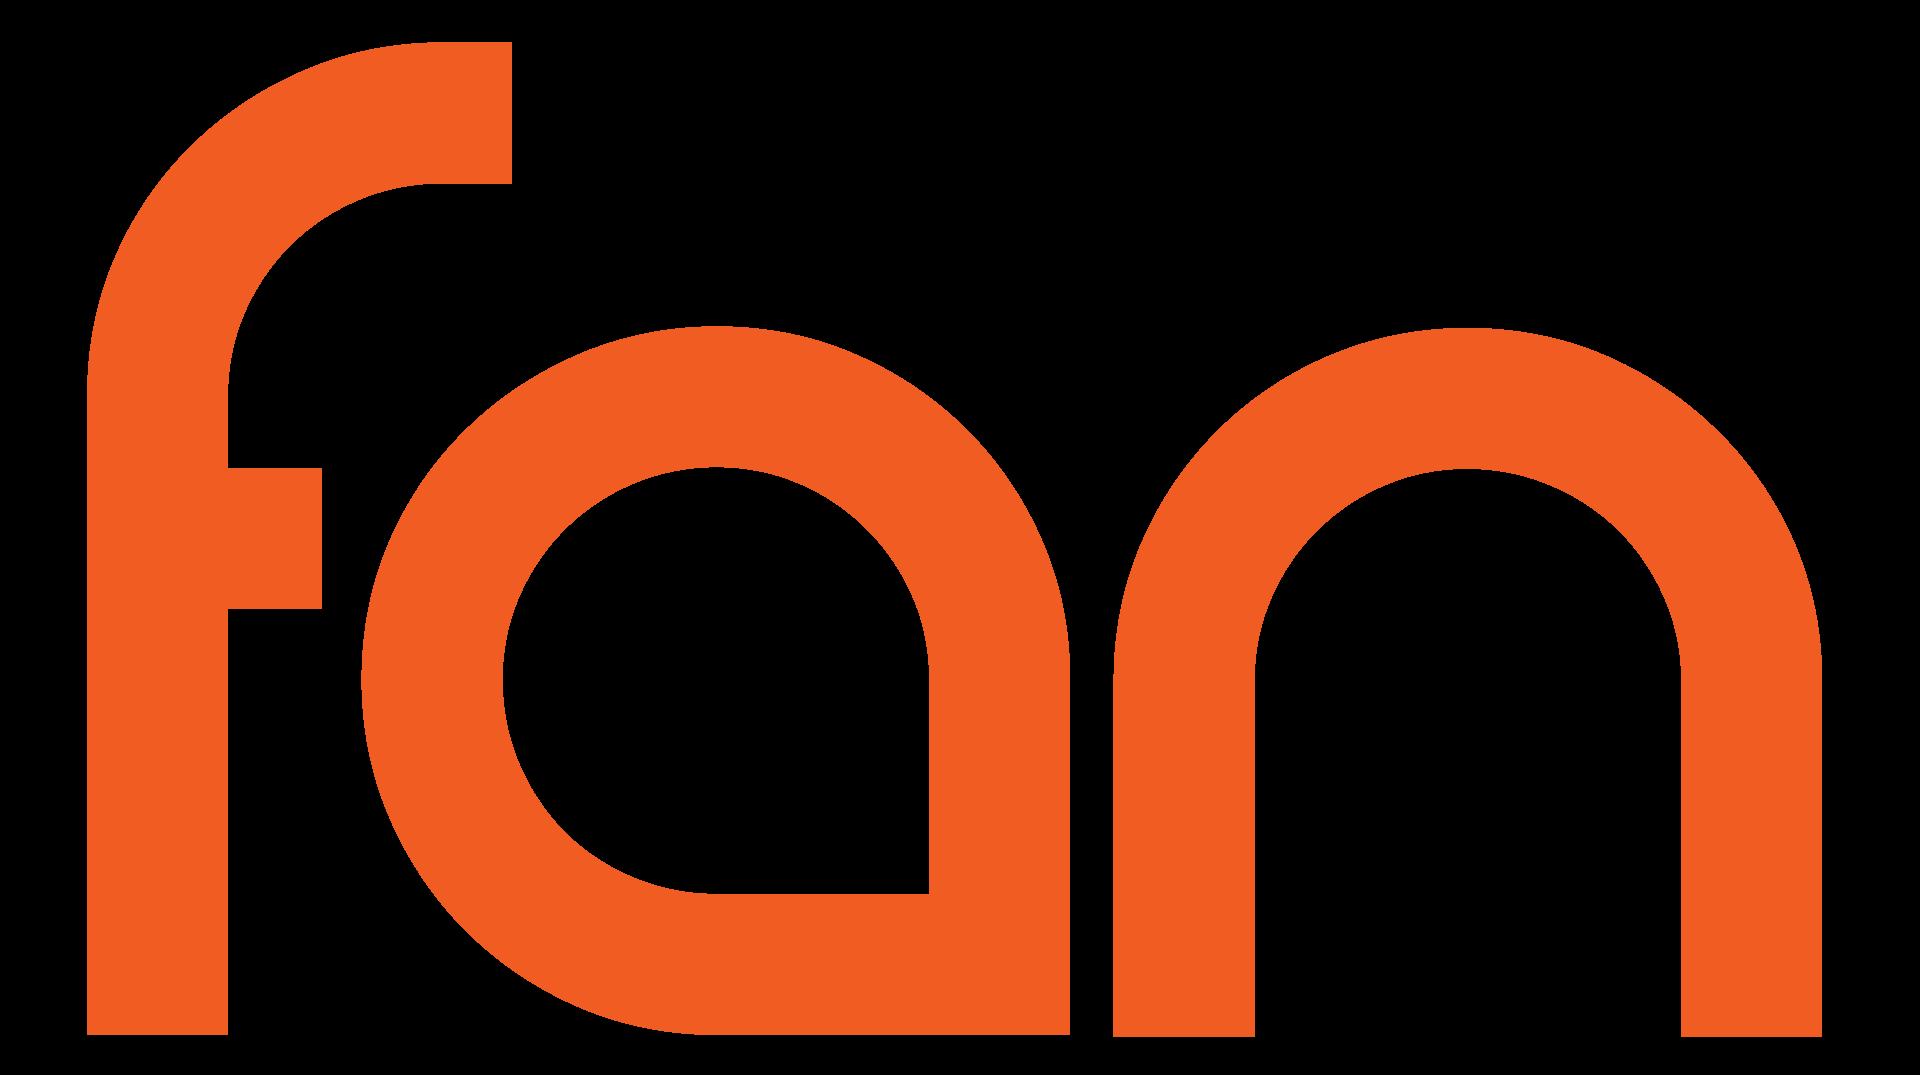 logo-laranja-fan-x